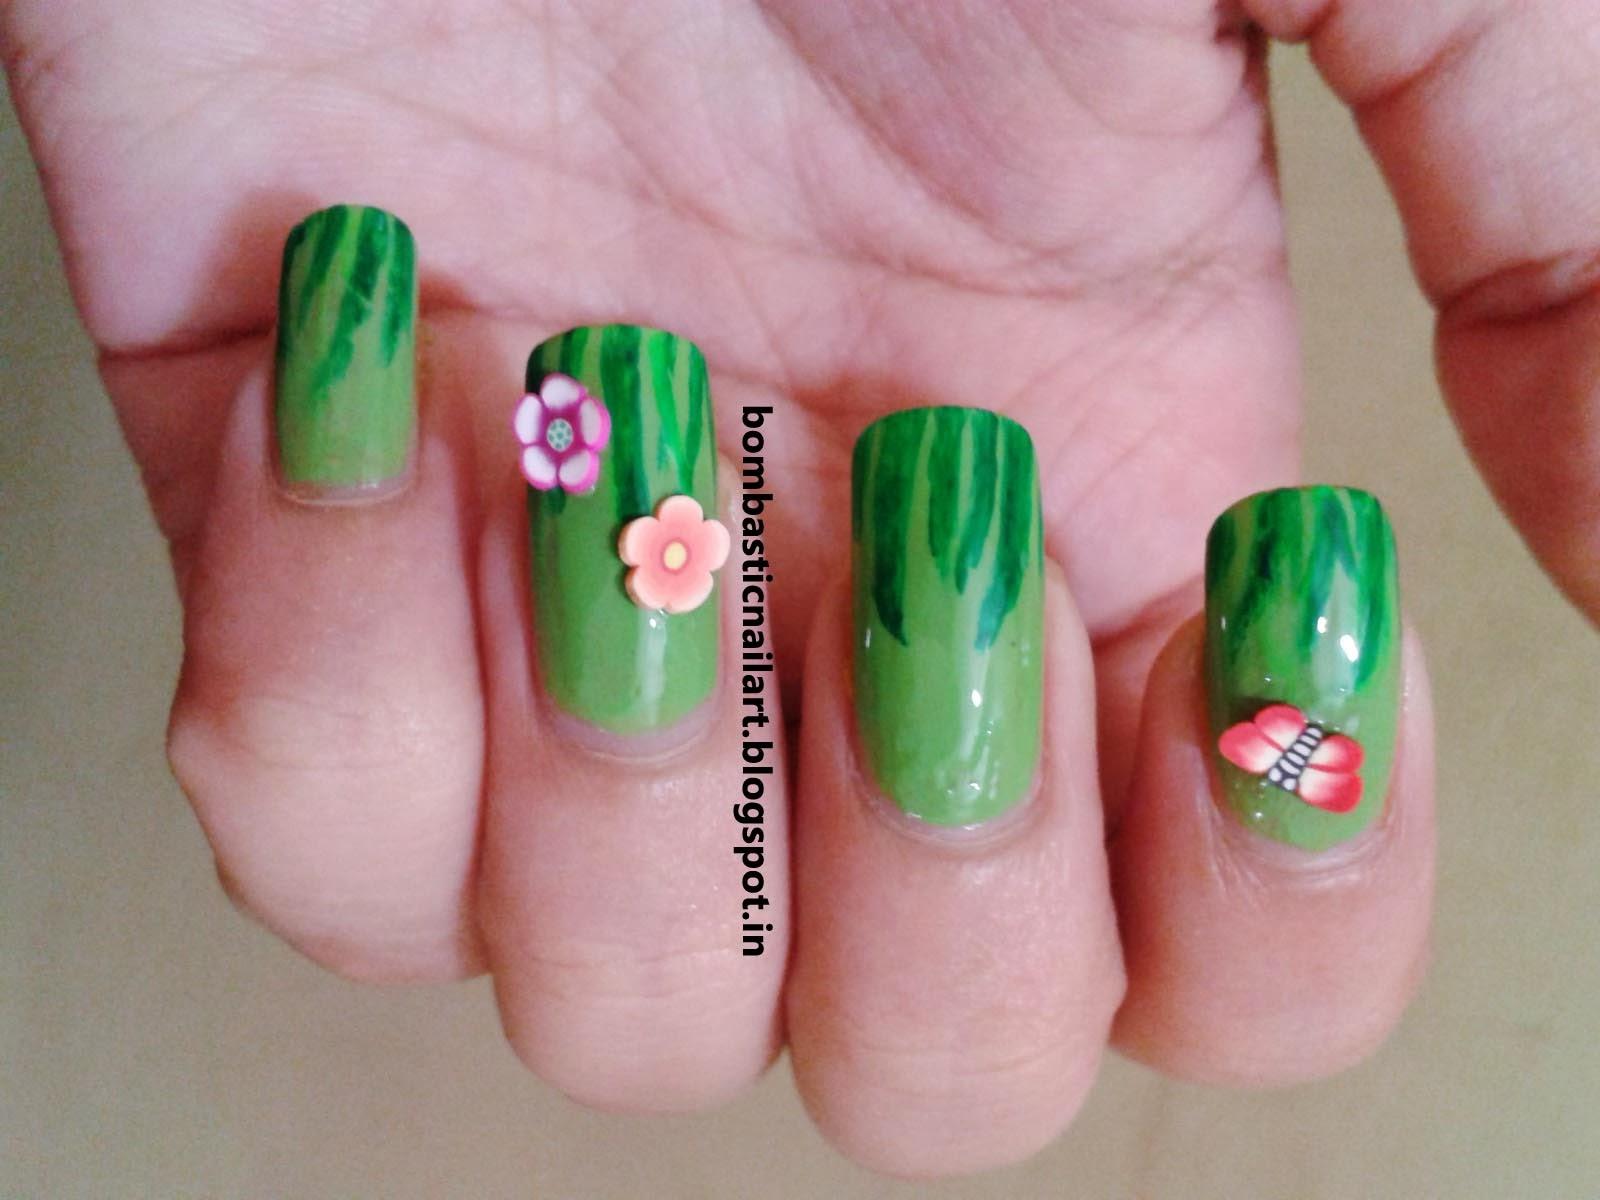 Day 4: Grassy Green Nails – Bombastic Nail Art